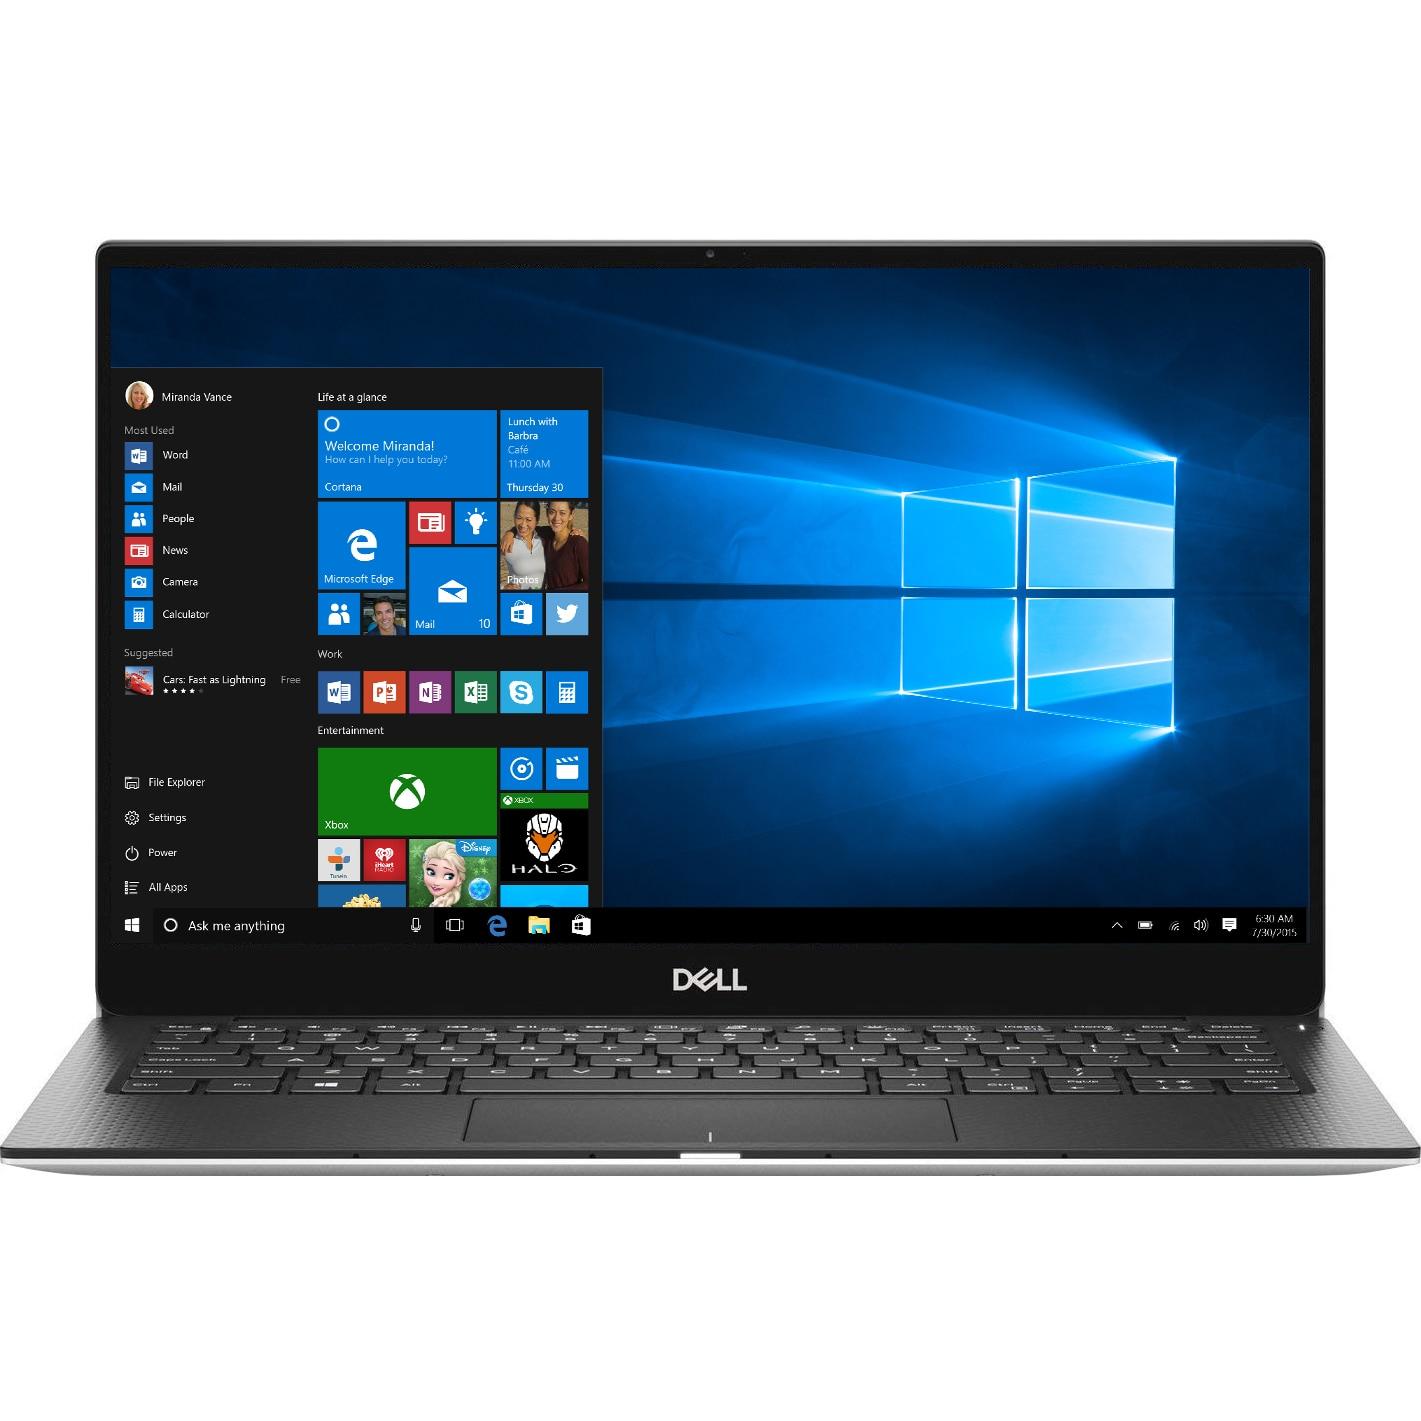 "Fotografie Laptop ultraportabil Dell XPS 13 9380 cu procesor Intel® Core™ i7-8565U pana la 4.60 GHz Whiskey Lake, 13.3"", 4K Ultra HD, Touch, 16GB, 1TB SSD, Intel UHD Graphics 620, Windows 10 Pro, Platinum Silver"